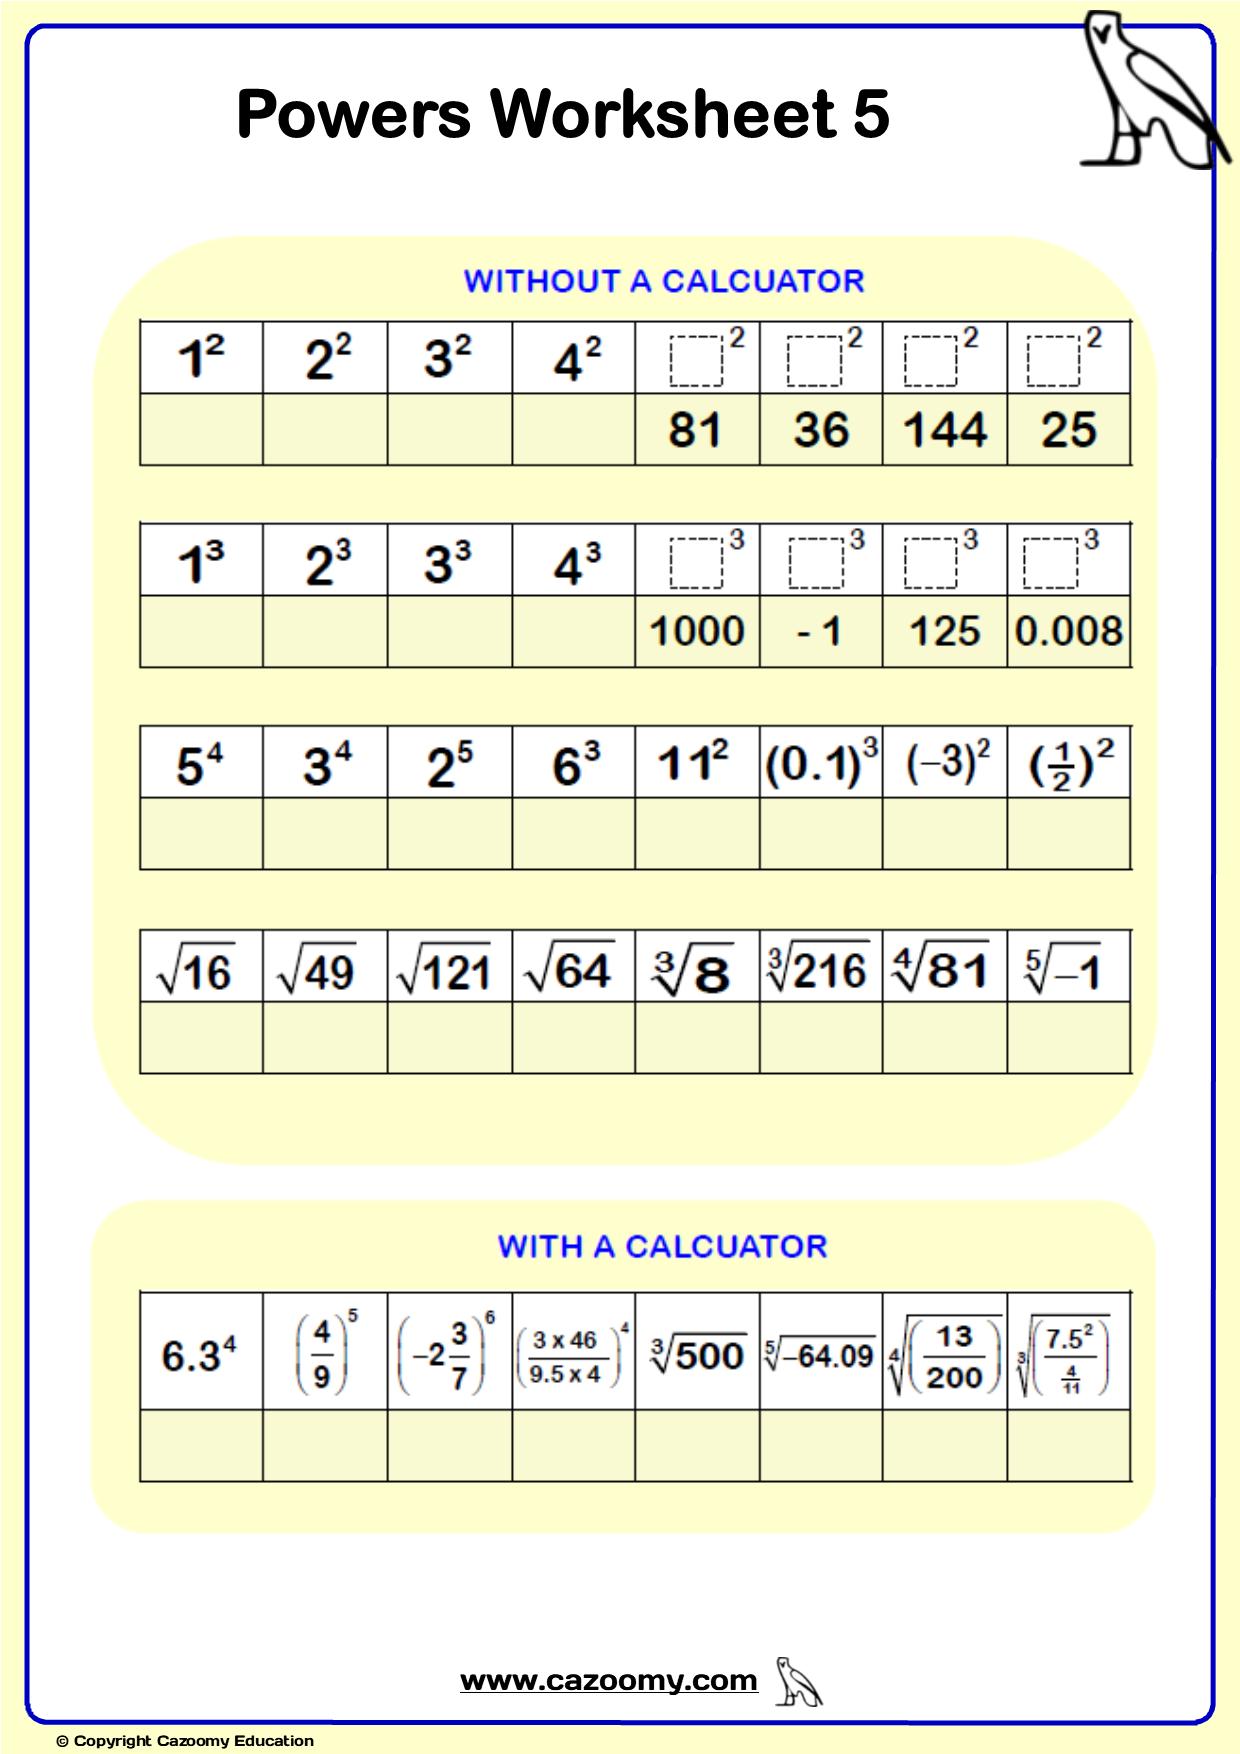 Powers Maths Worksheet 6